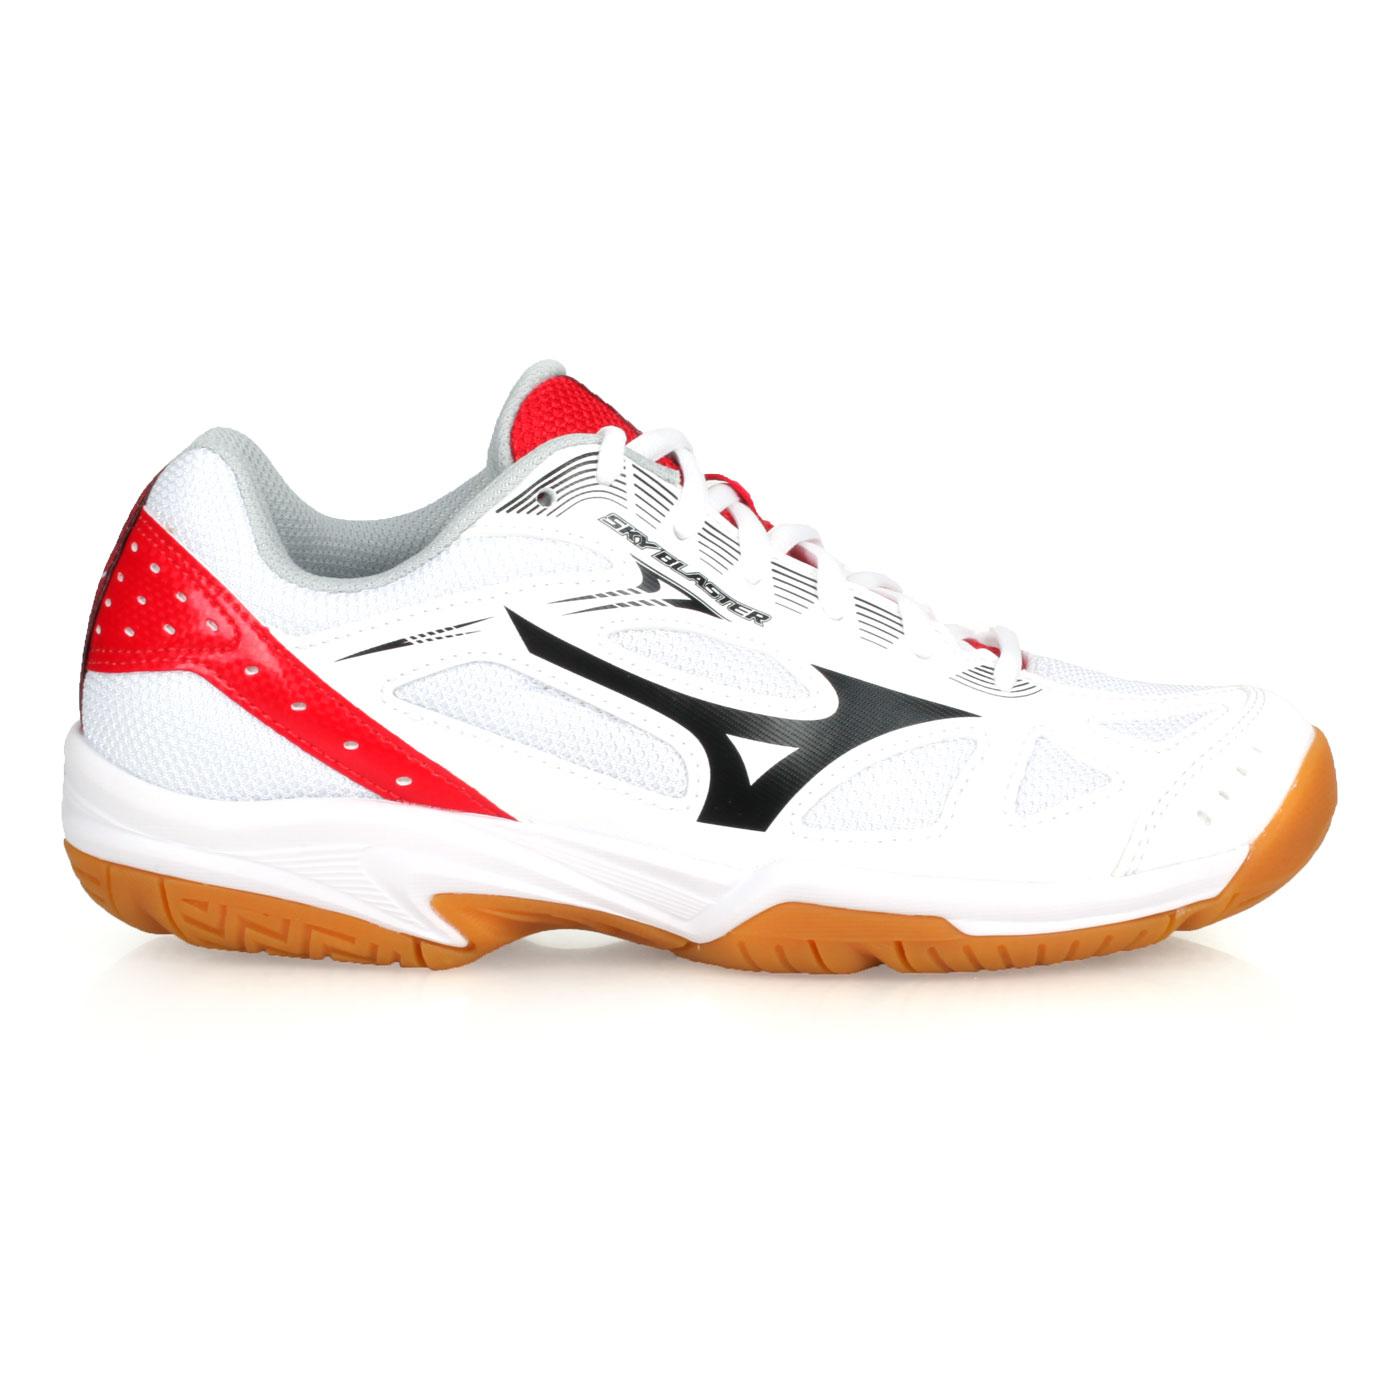 MIZUNO 羽球鞋  @SKY BLASTER@71GA194563 - 白白黑紅